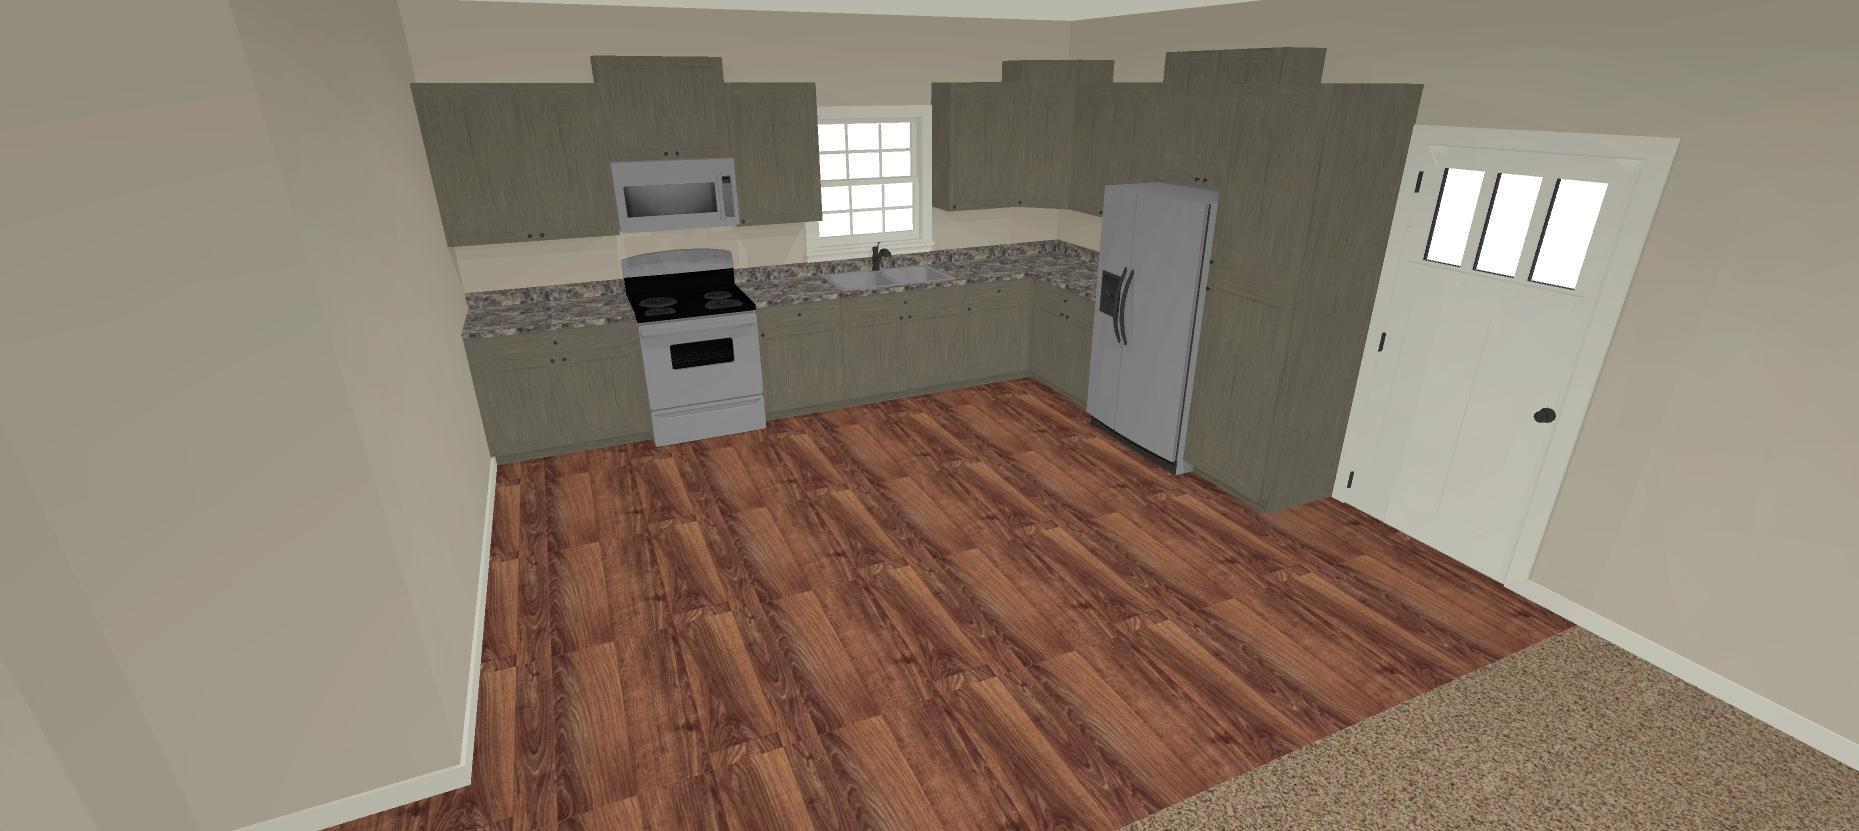 Spencer kitchen.jpg